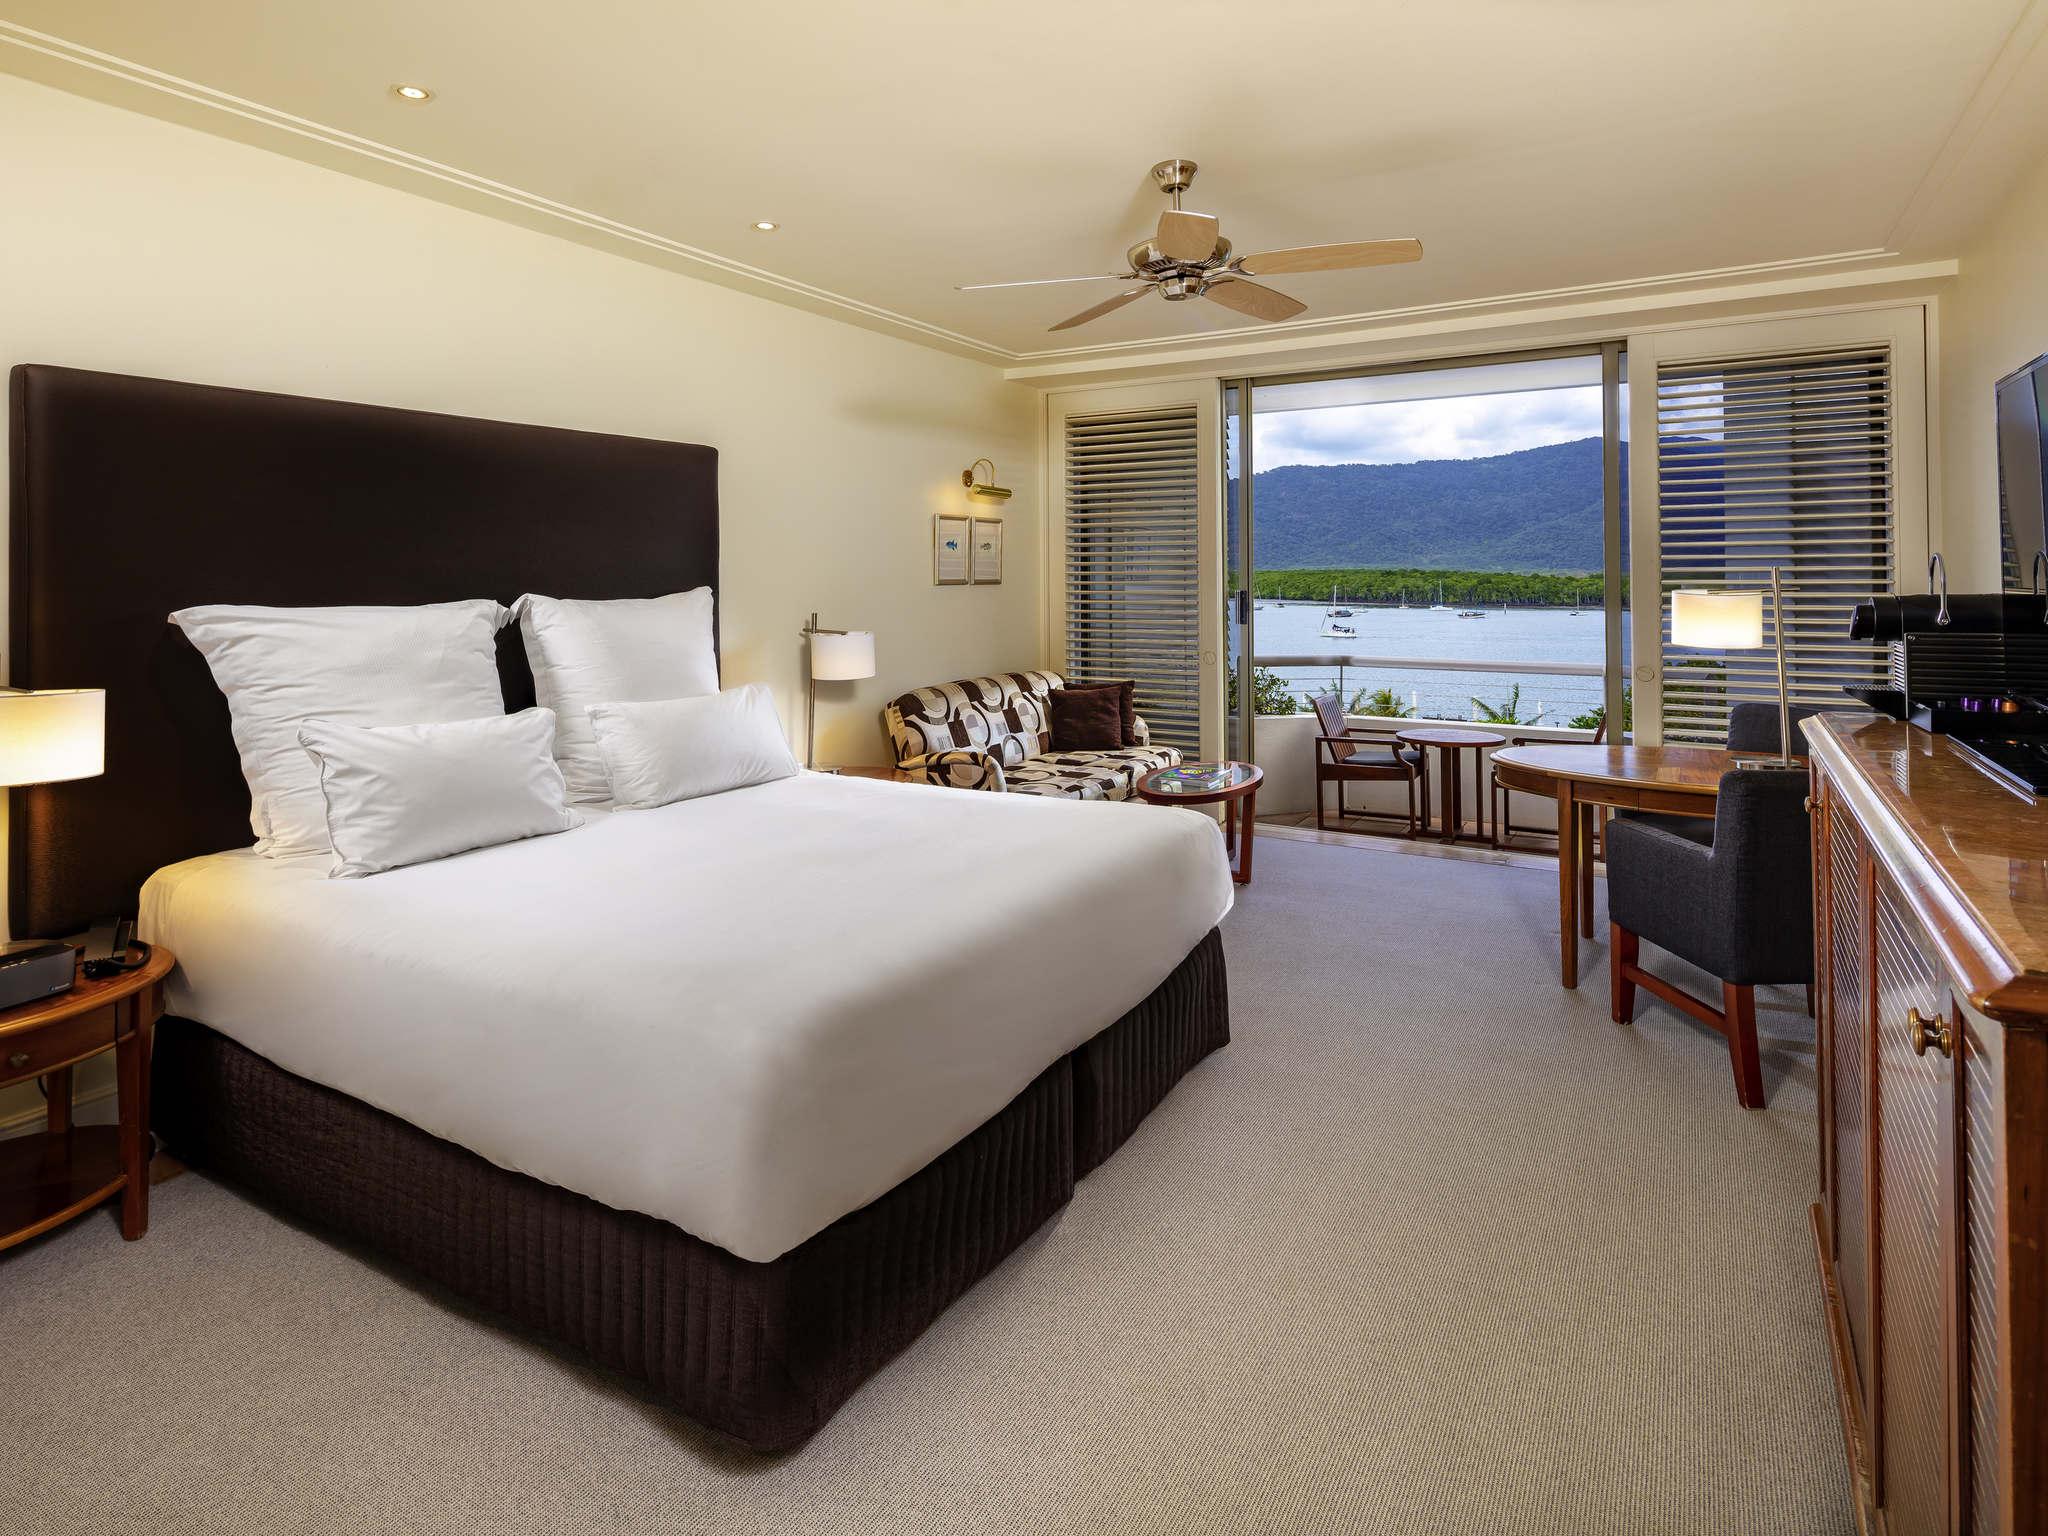 Pullman reef casino hotel cairns australia best sportsbook online - internet gambling lines